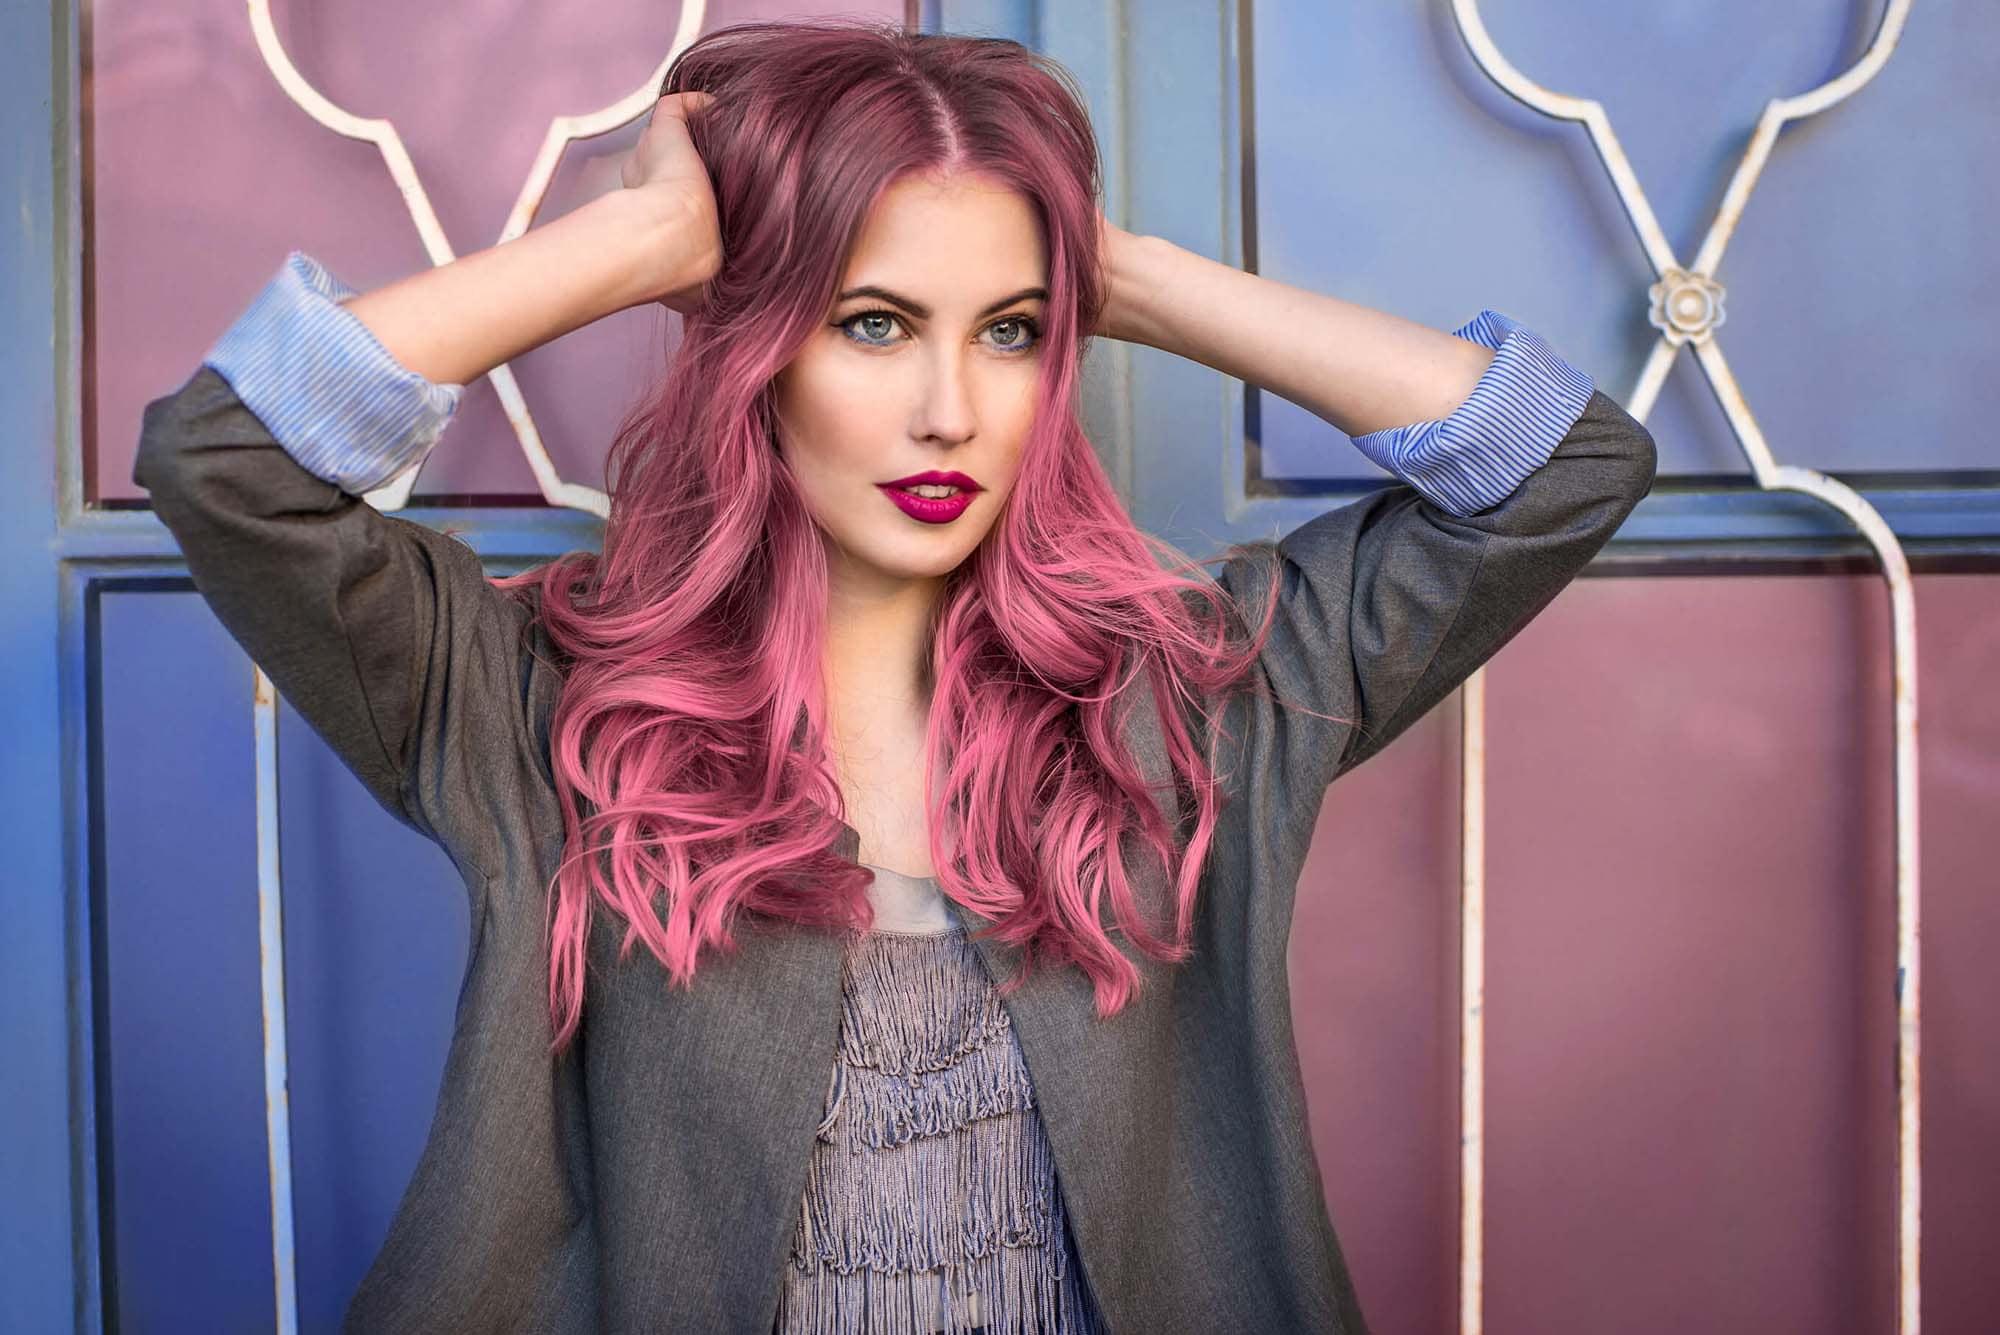 Warna rambut deep rosy pink pada rambut keriting panjang.